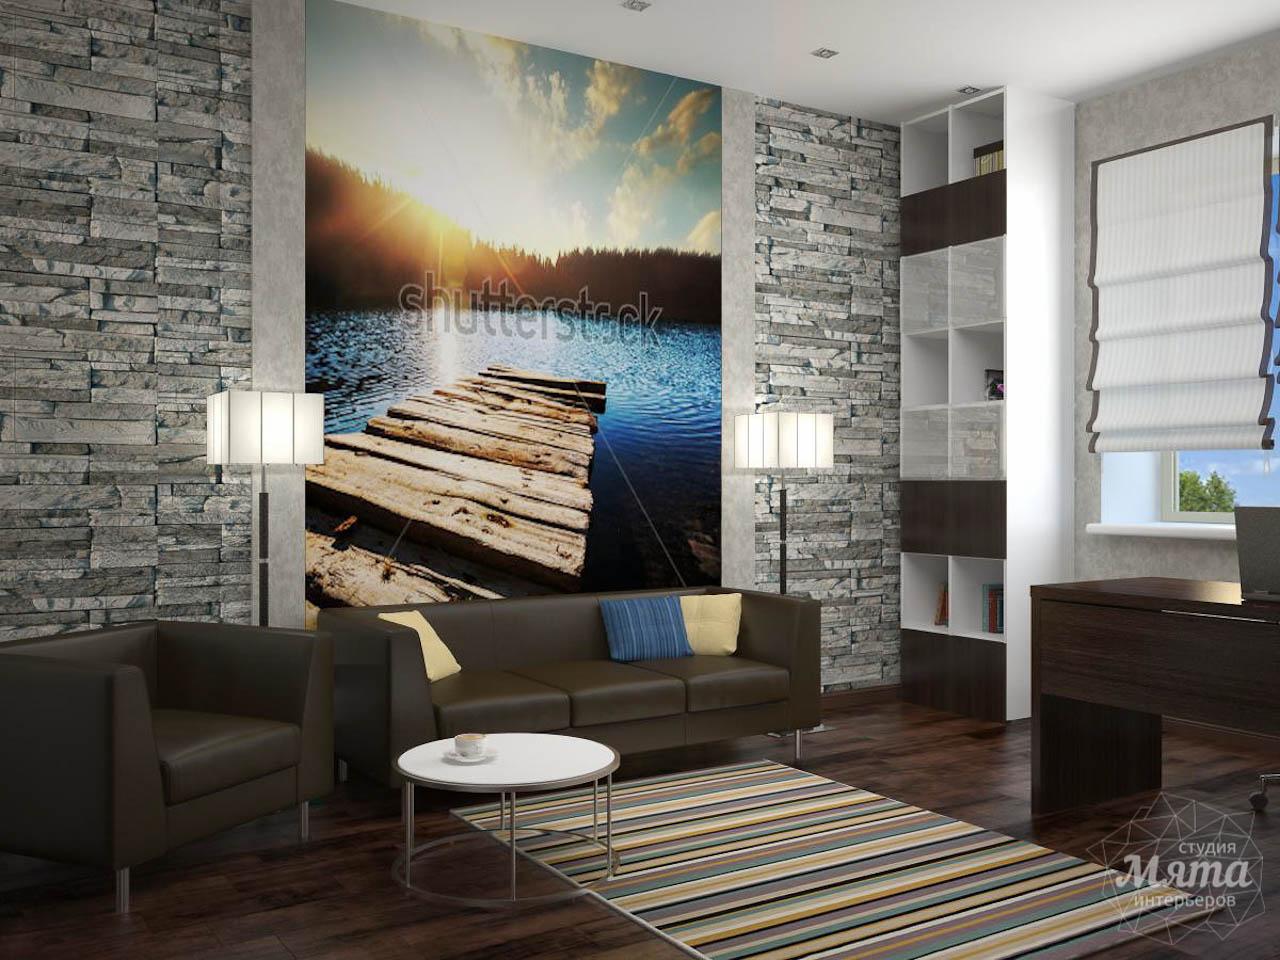 Дизайн проект интерьера коттеджа  в стиле минимализм по ул. Барвинка 15 img63393334